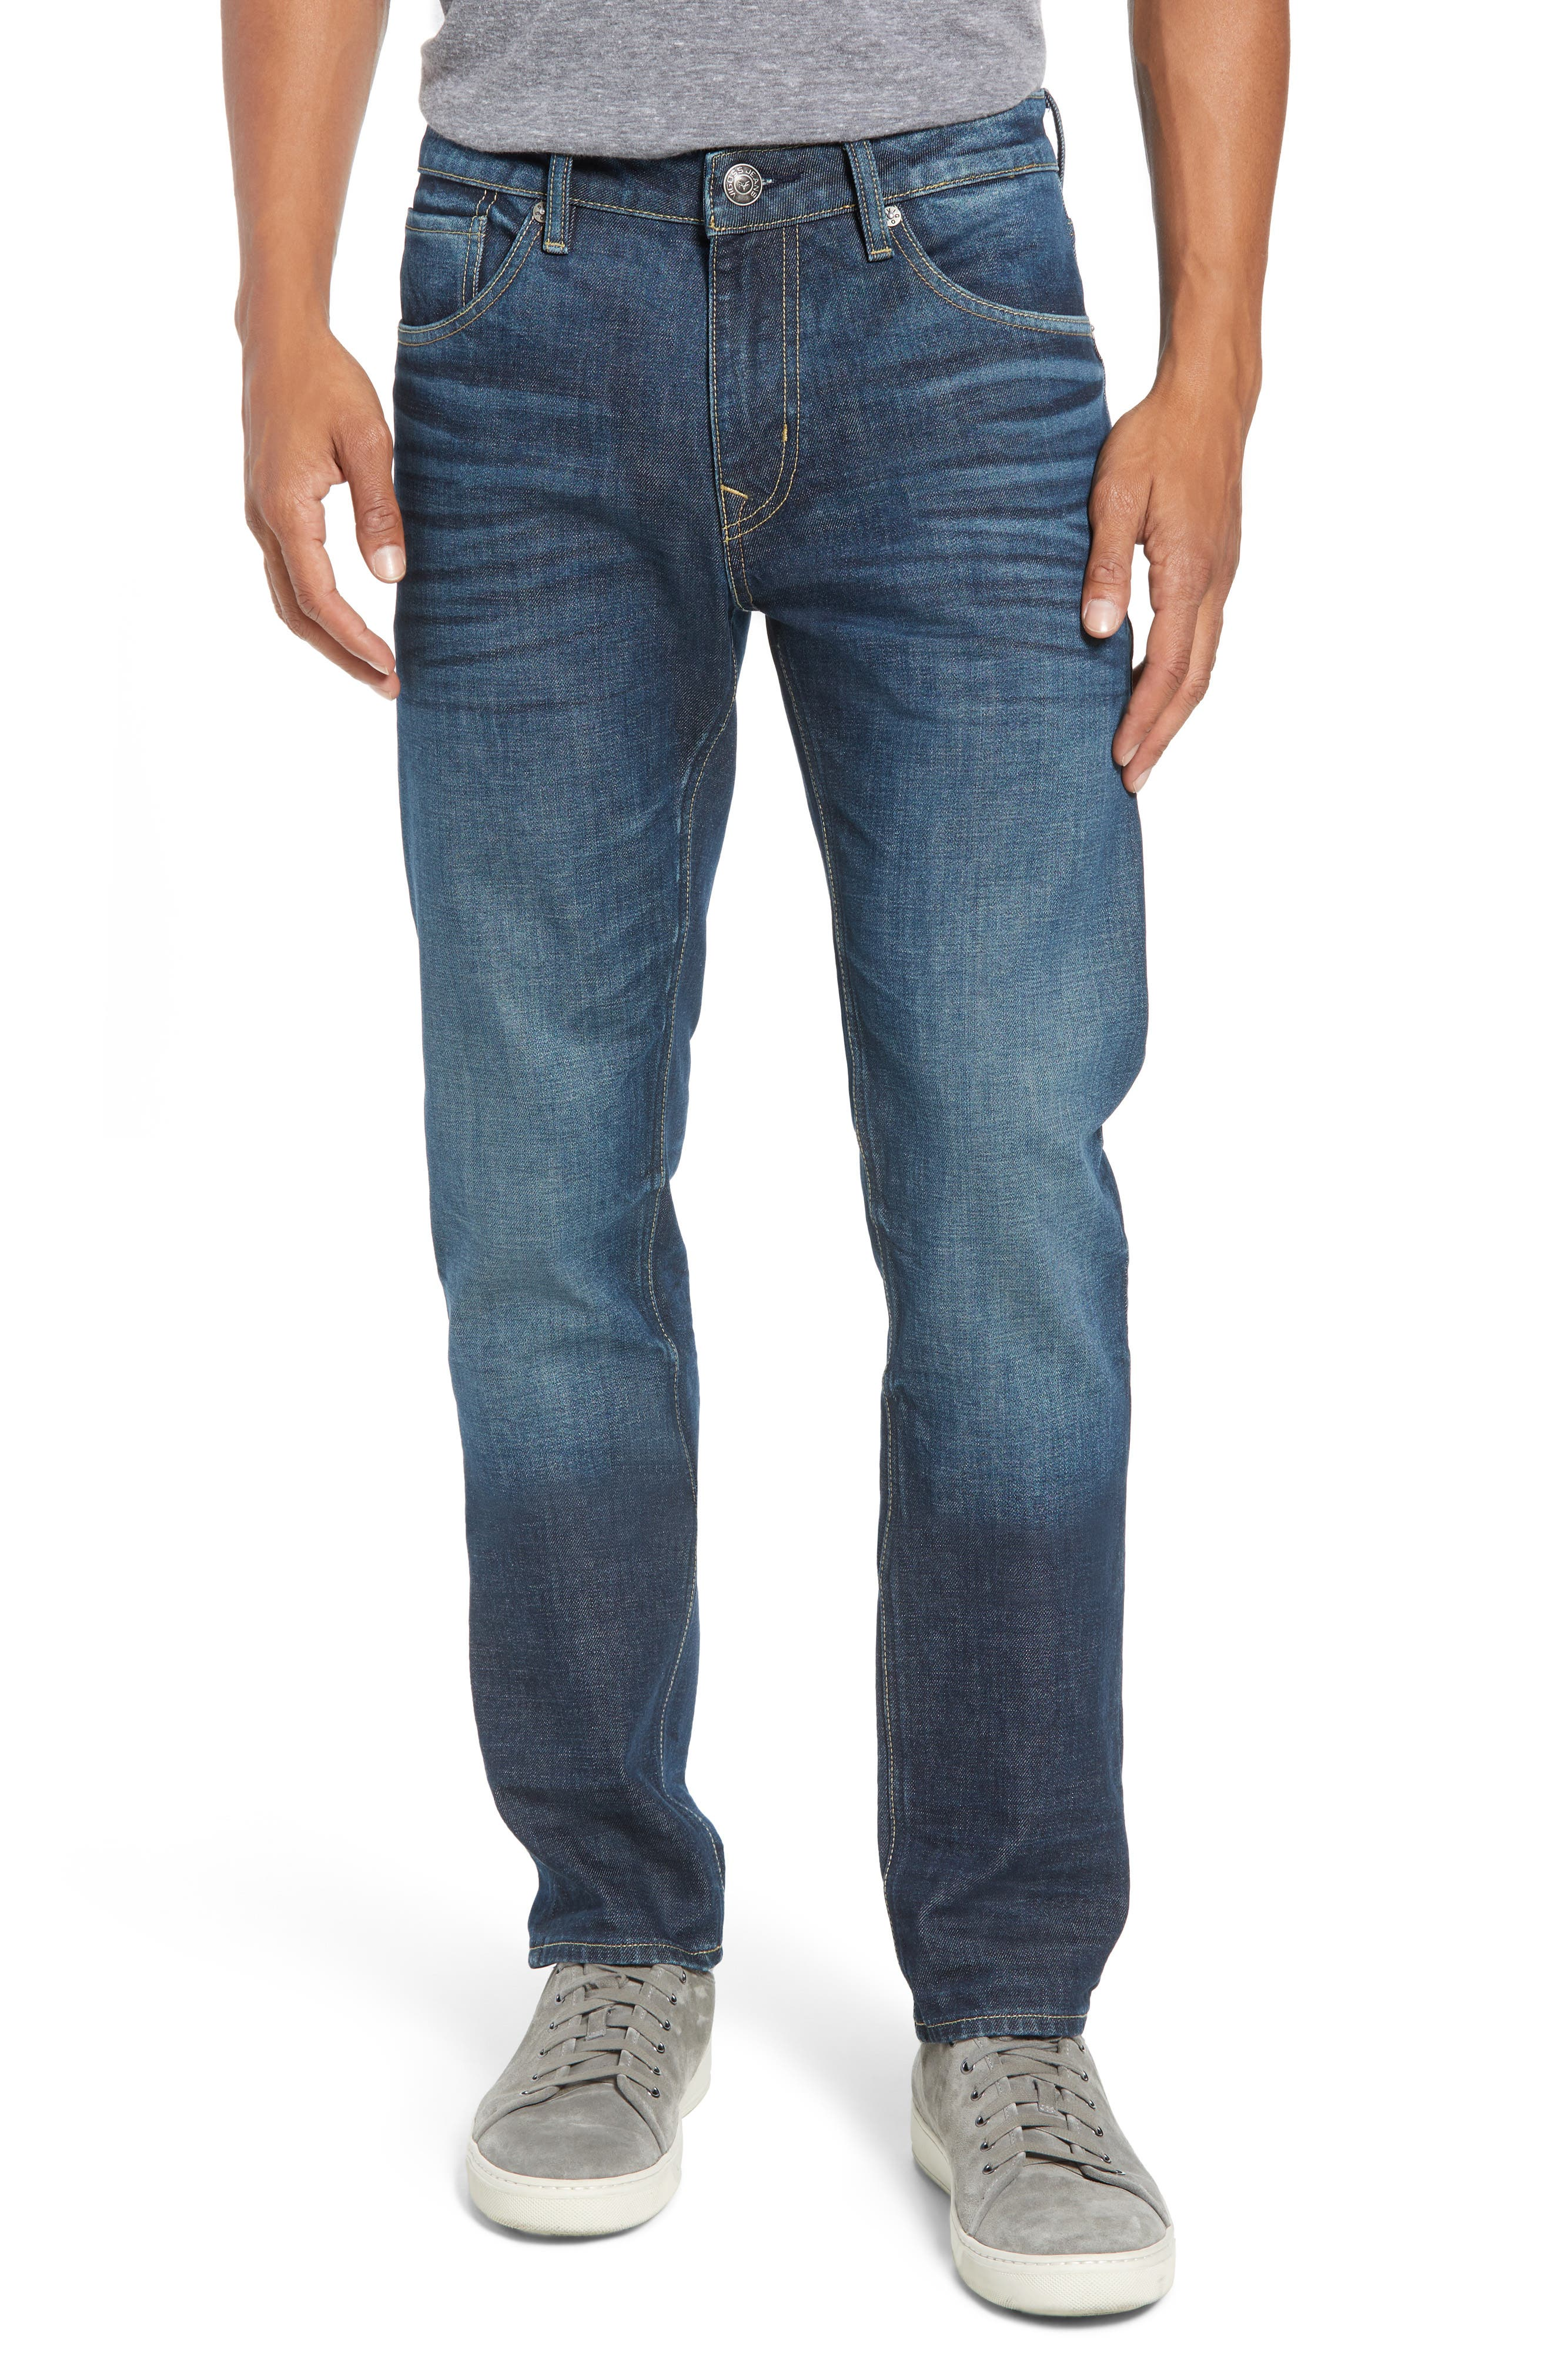 Mick Slim Fit Jeans,                             Main thumbnail 1, color,                             DARK 3D WASH